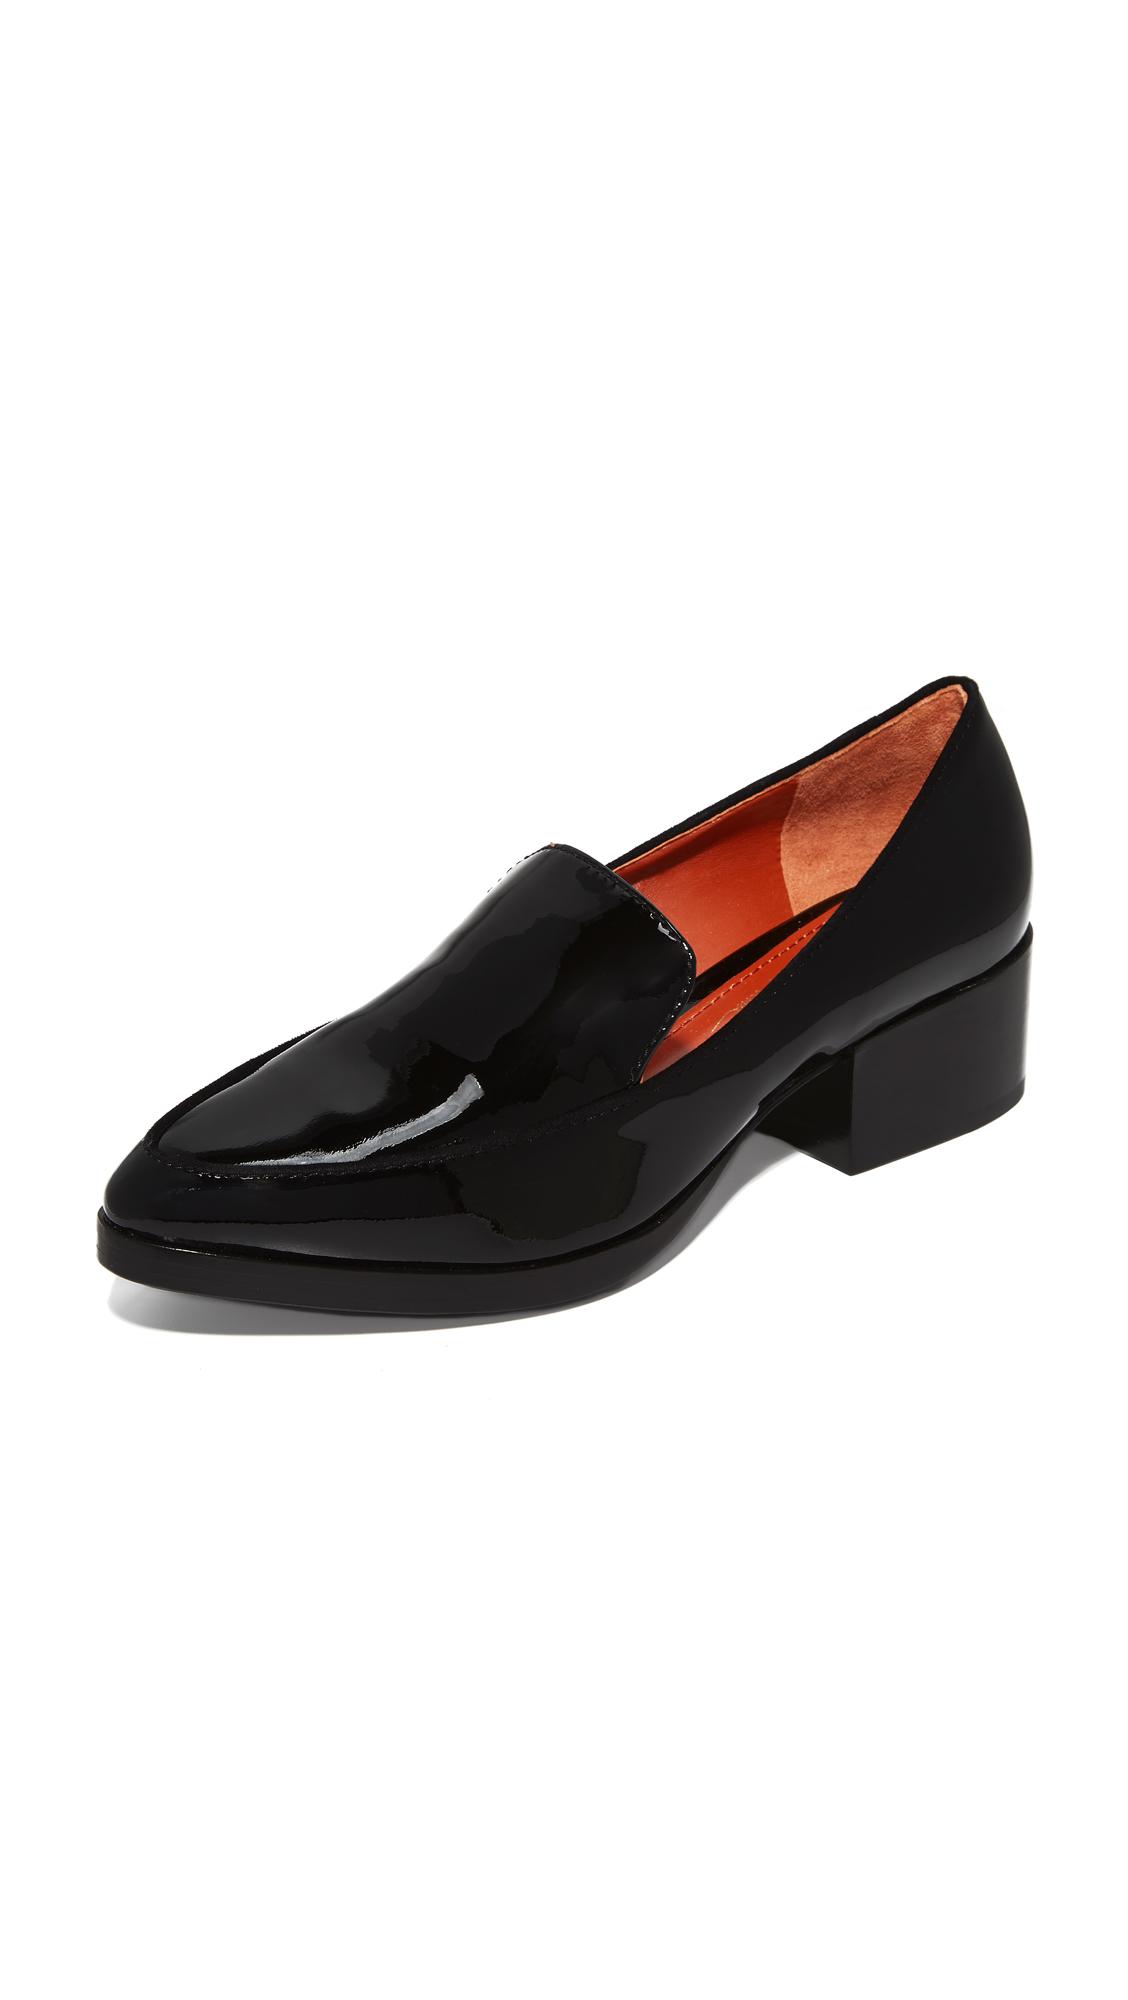 3.1 Phillip Lim Quinn Modern Loafers - Black